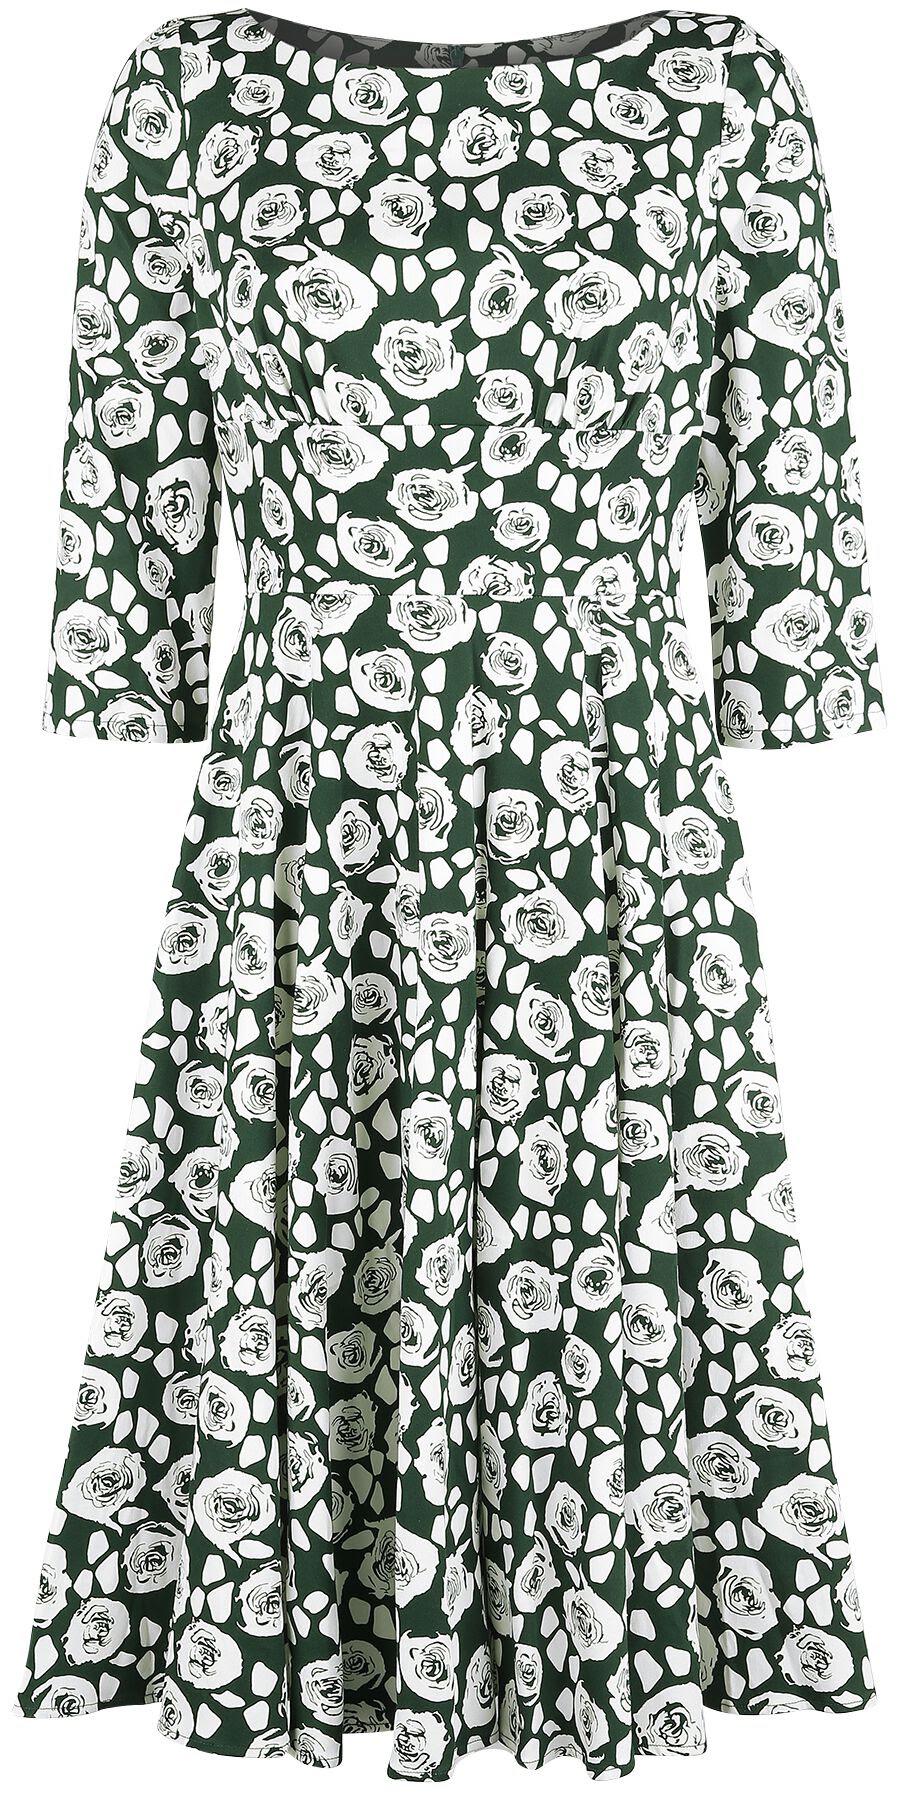 h&r london - white roses dress - kleid knielang - dunkelgrün|weiß